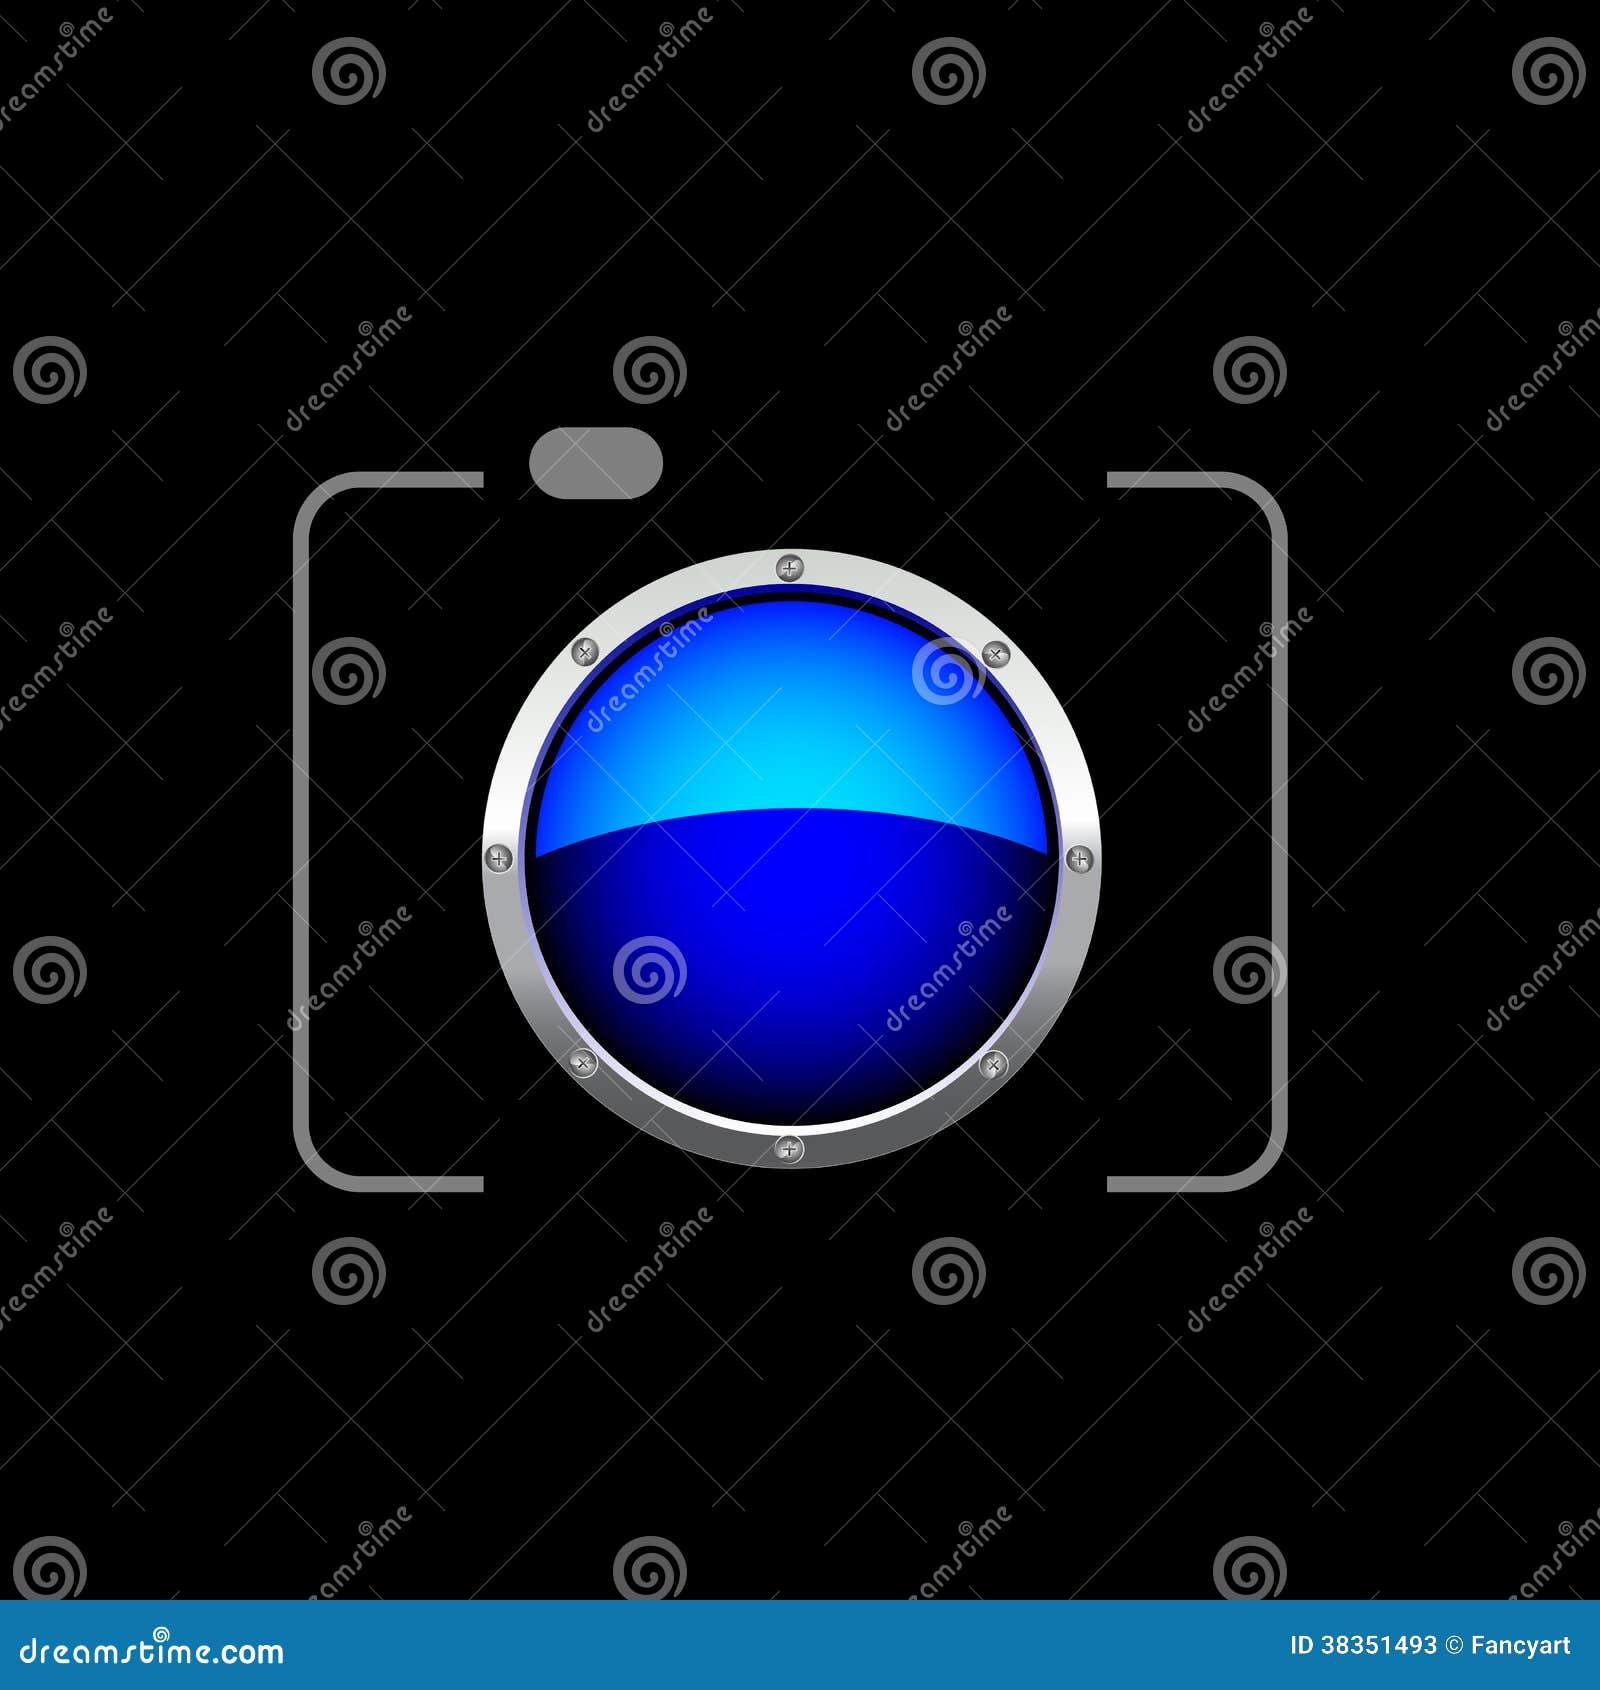 Digital Camera - photography logo